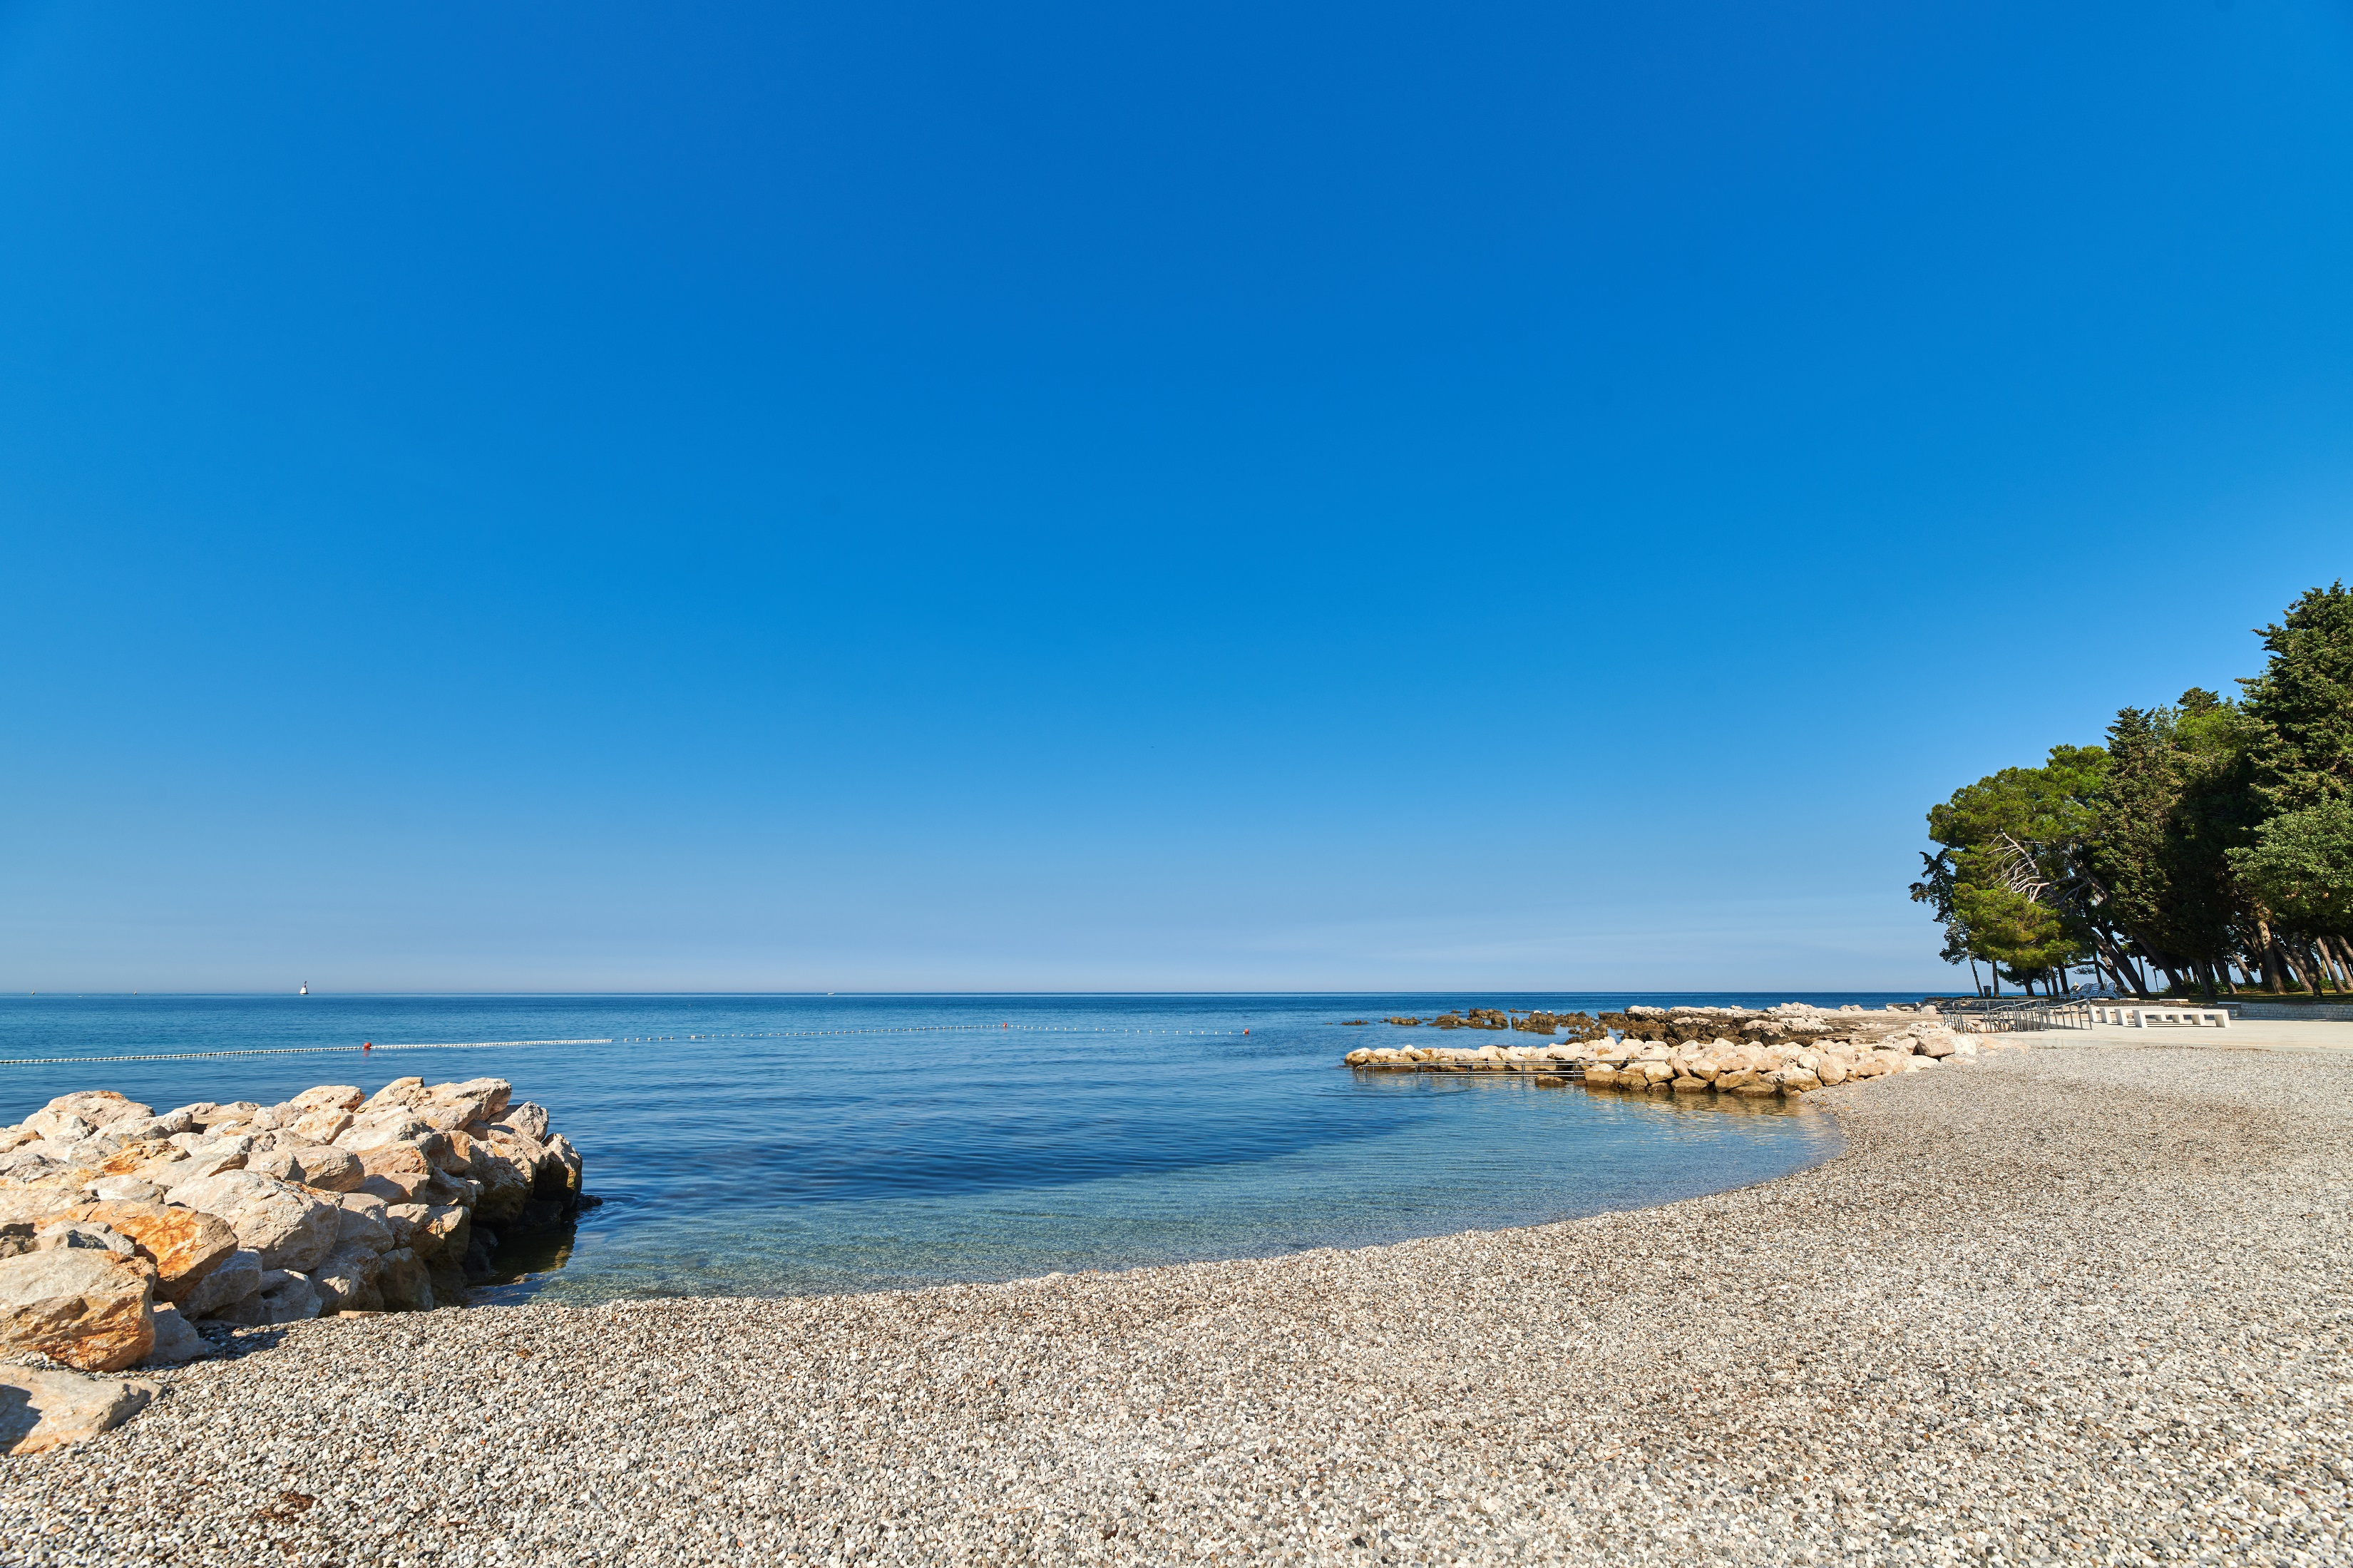 https://cms.satur.sk/data/imgs/tour_image/orig/stella_maris_resort_plava_laguna_2020_villas_beach-resized-1800592.jpg